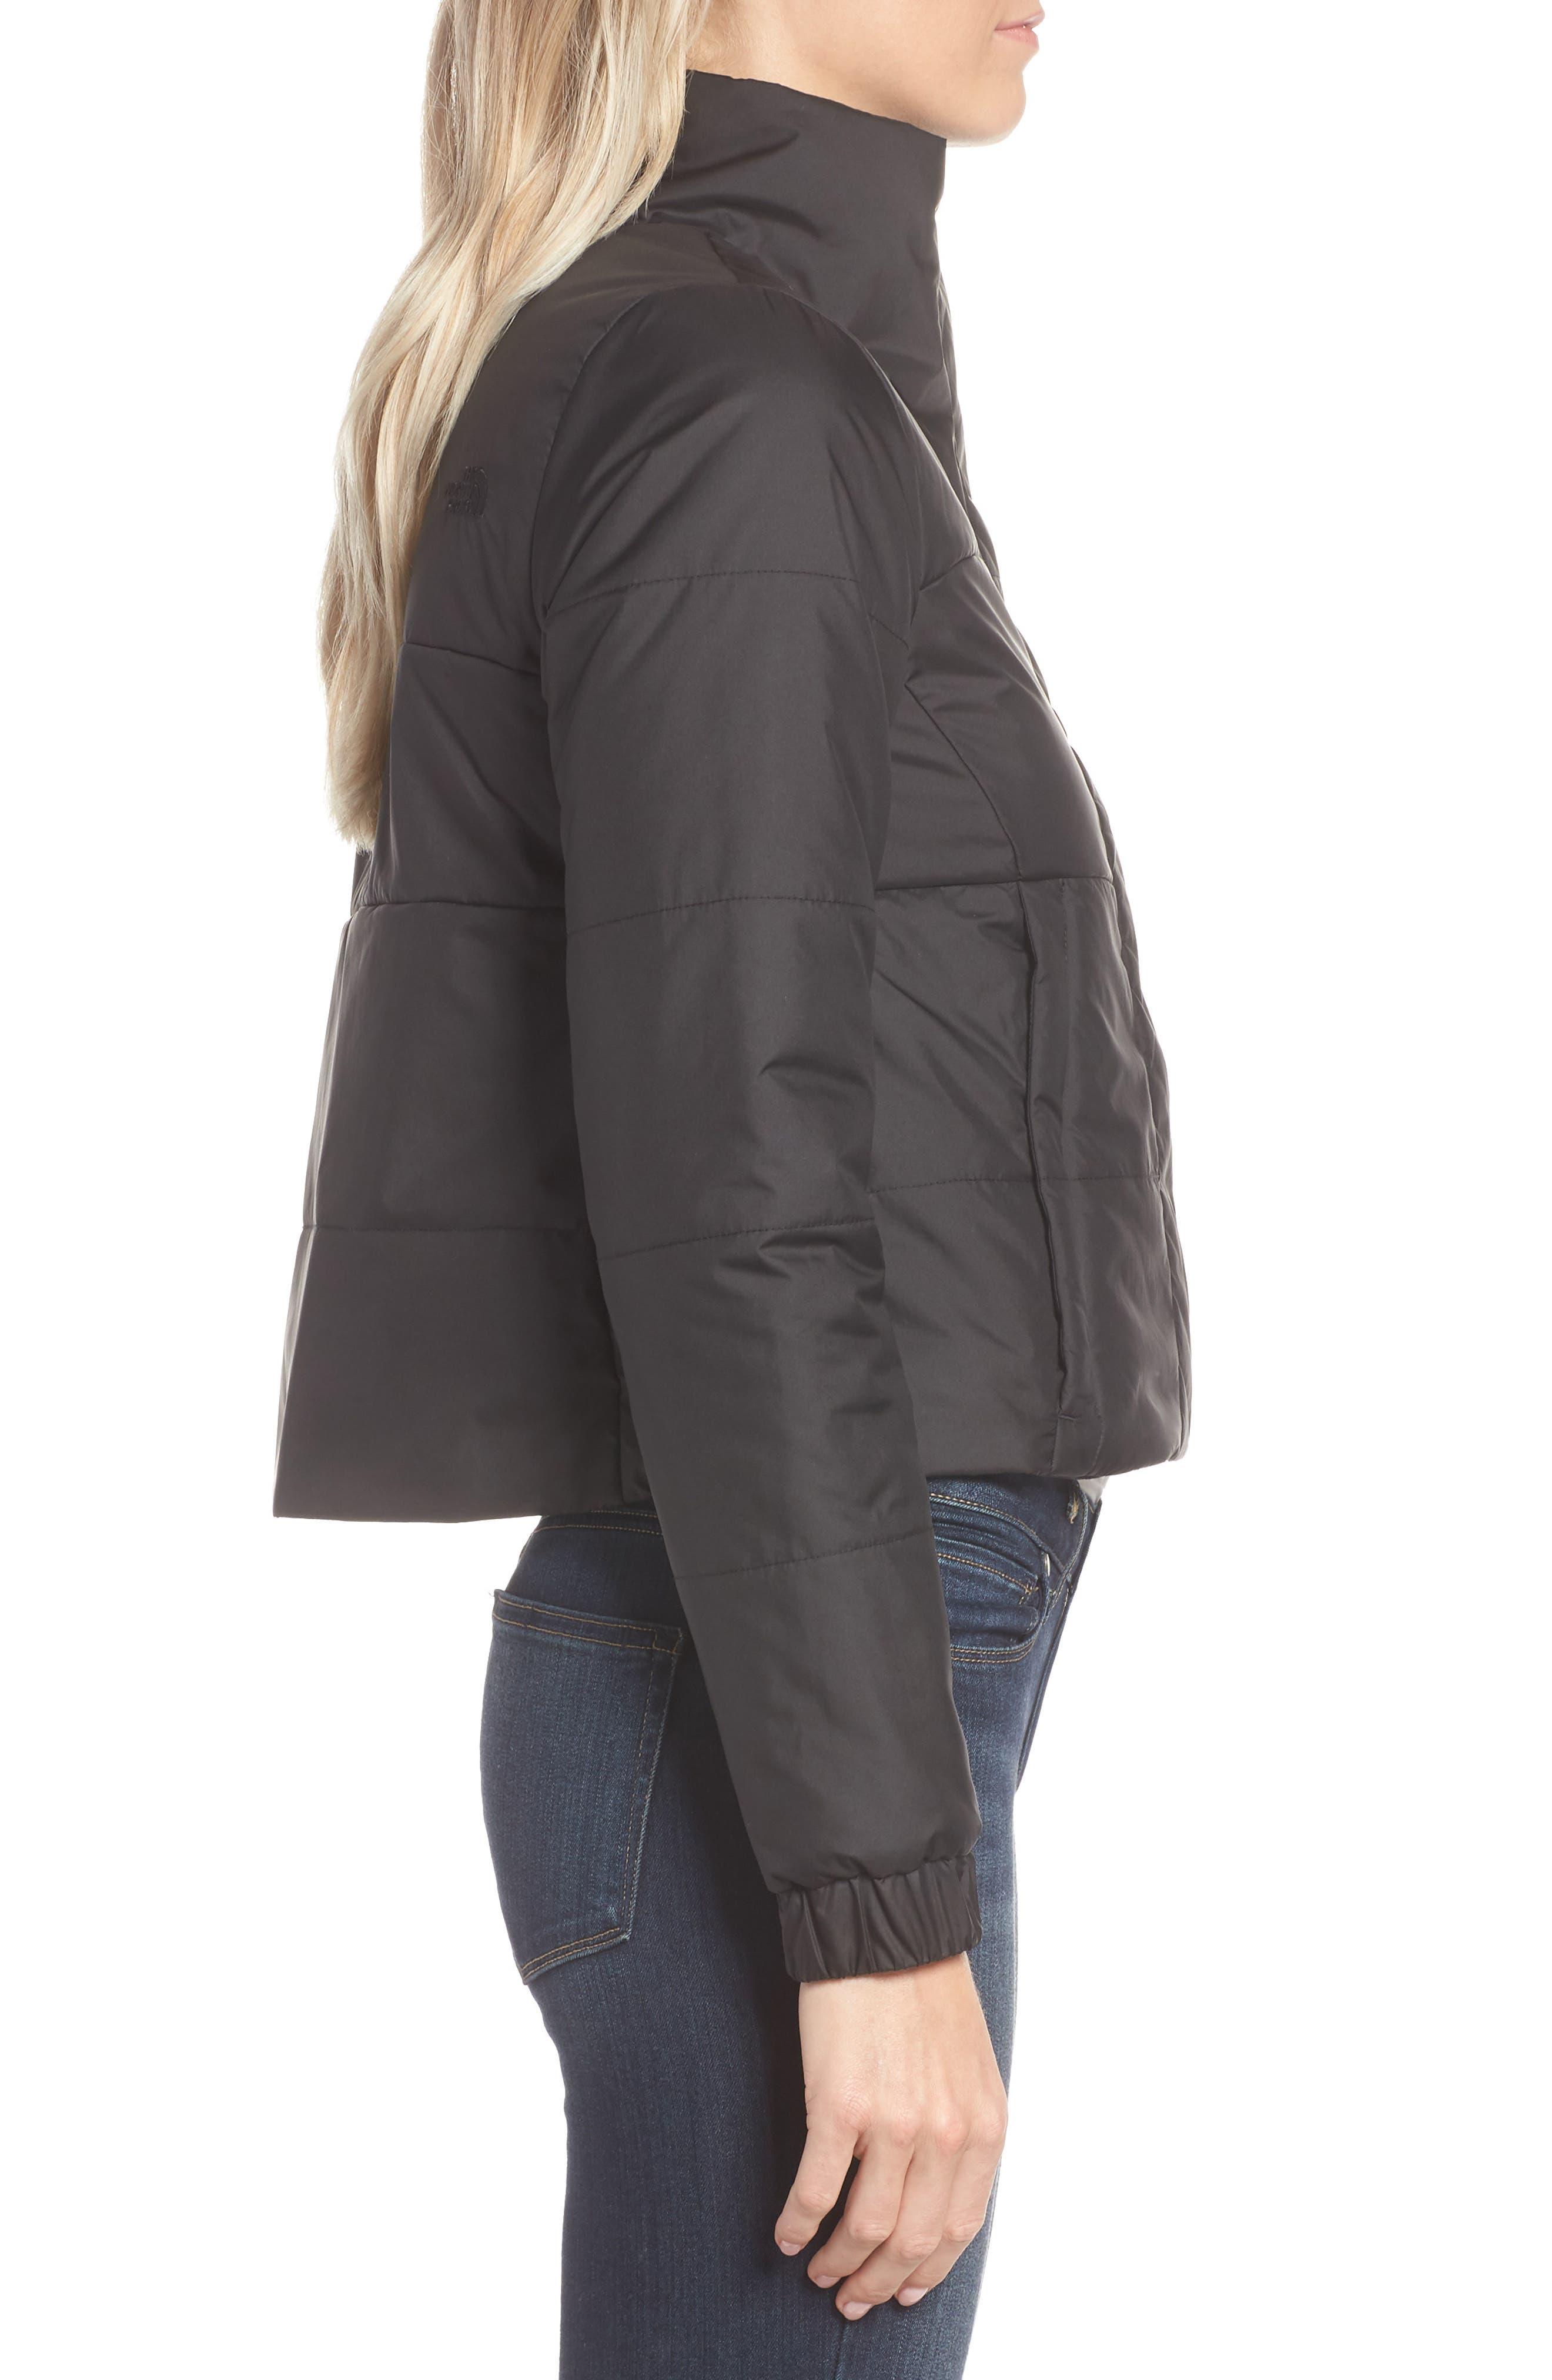 THE NORTH FACE, Femtastic Heatseeker Insulated Jacket, Alternate thumbnail 4, color, TNF BLACK